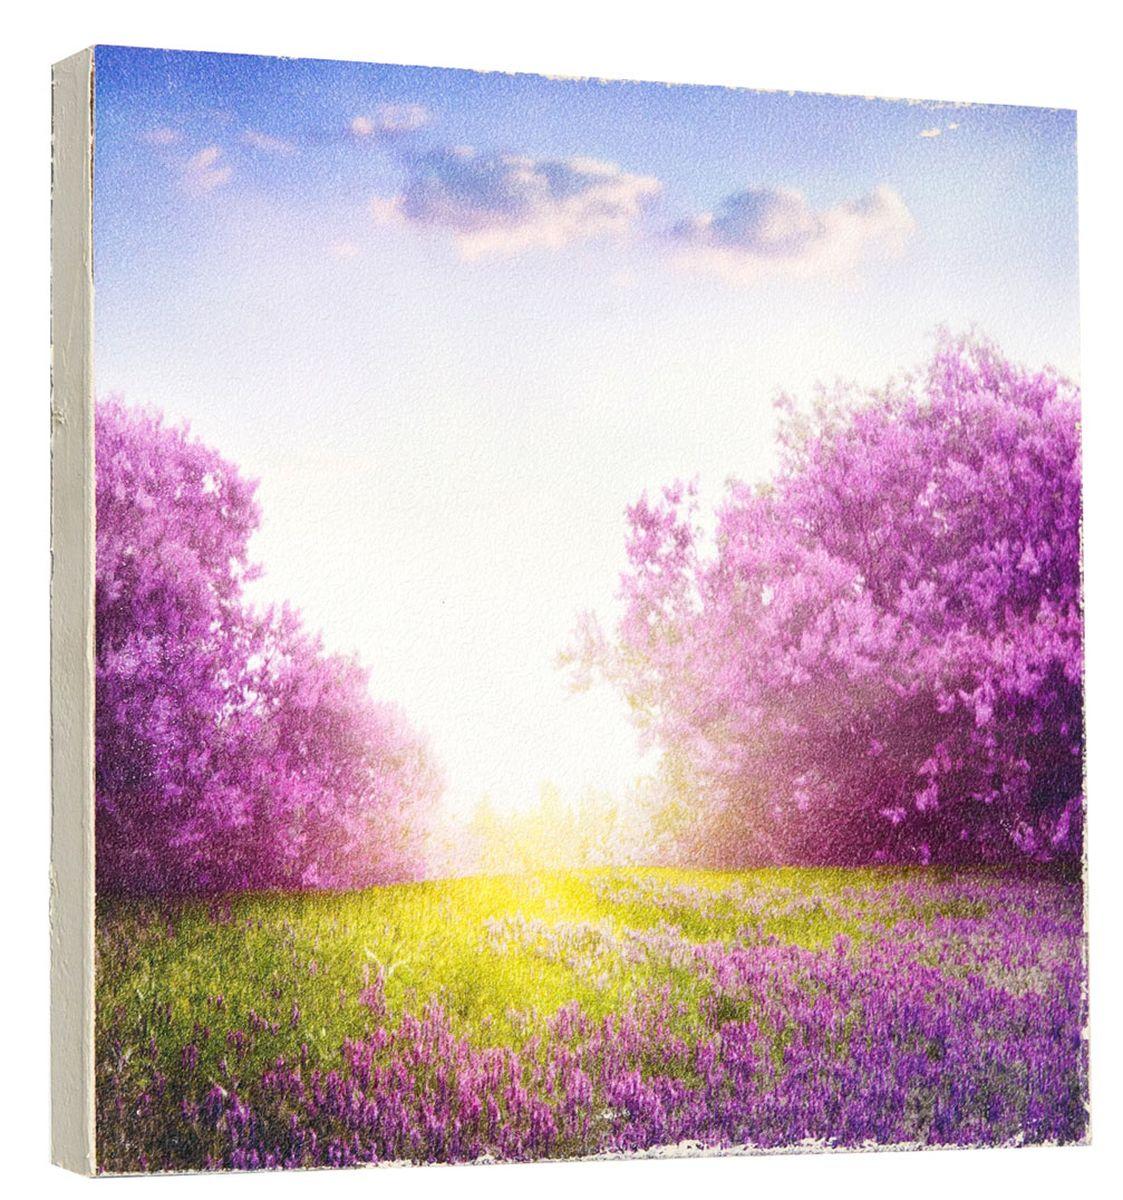 Картина Mister Poster Цветочные сады в солнечных лучах, 22 х 22 см0289-22-22